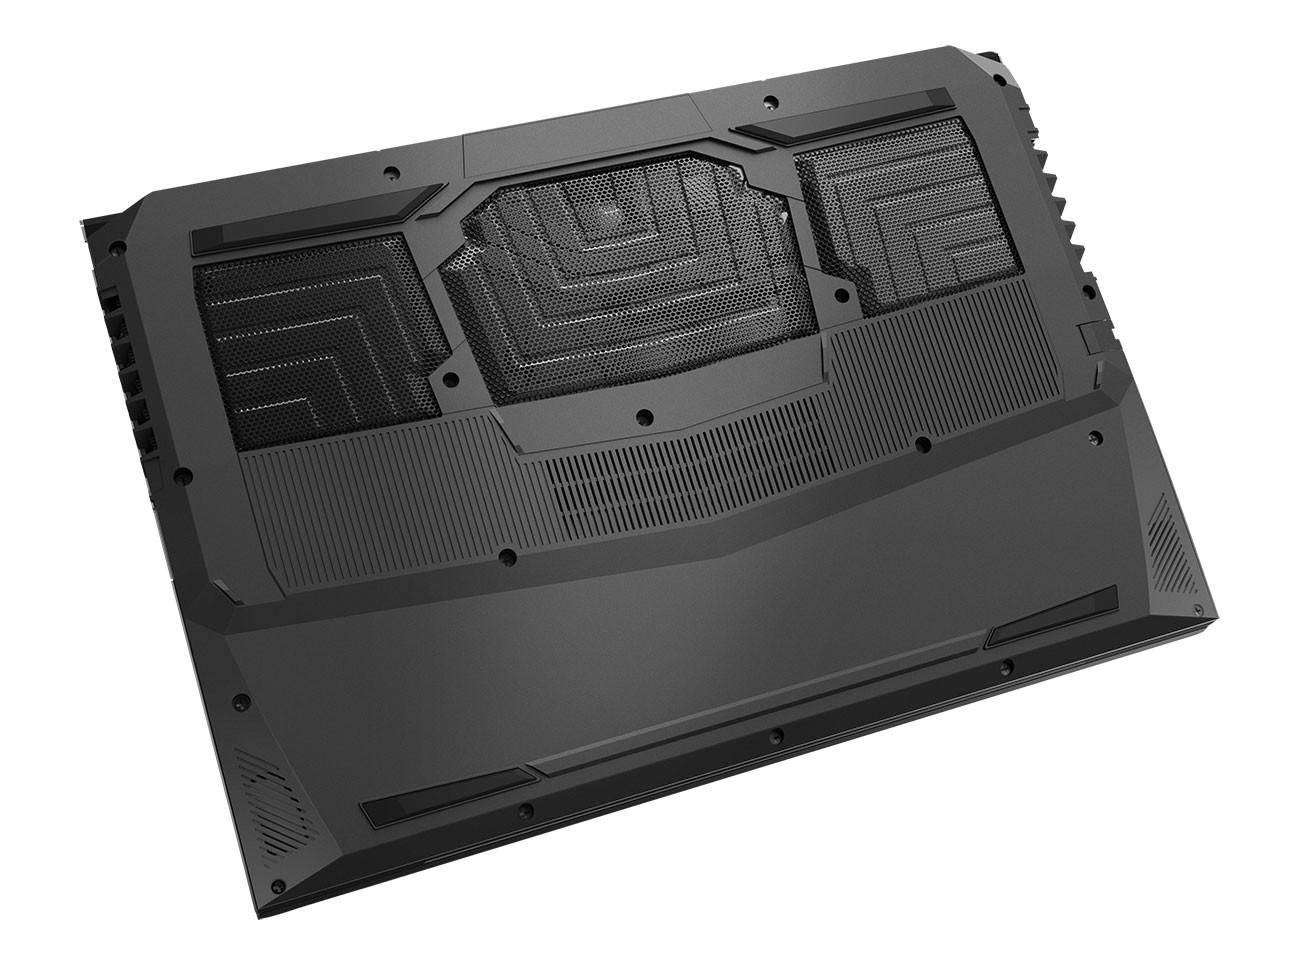 wccftech-origin-pc-evo-laptops-4